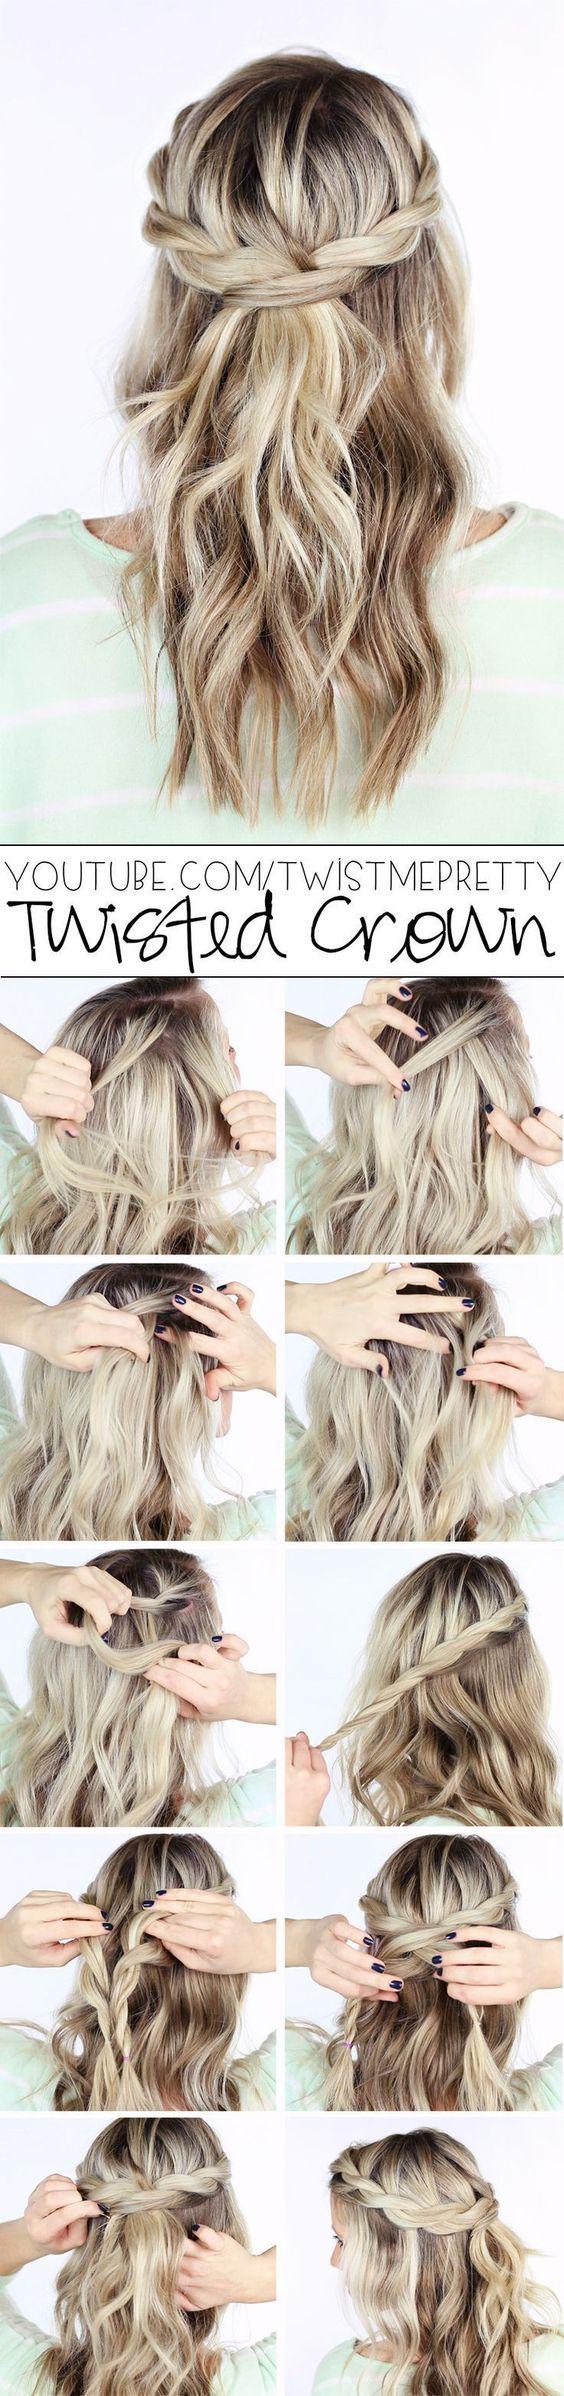 Curls with Crown Braid